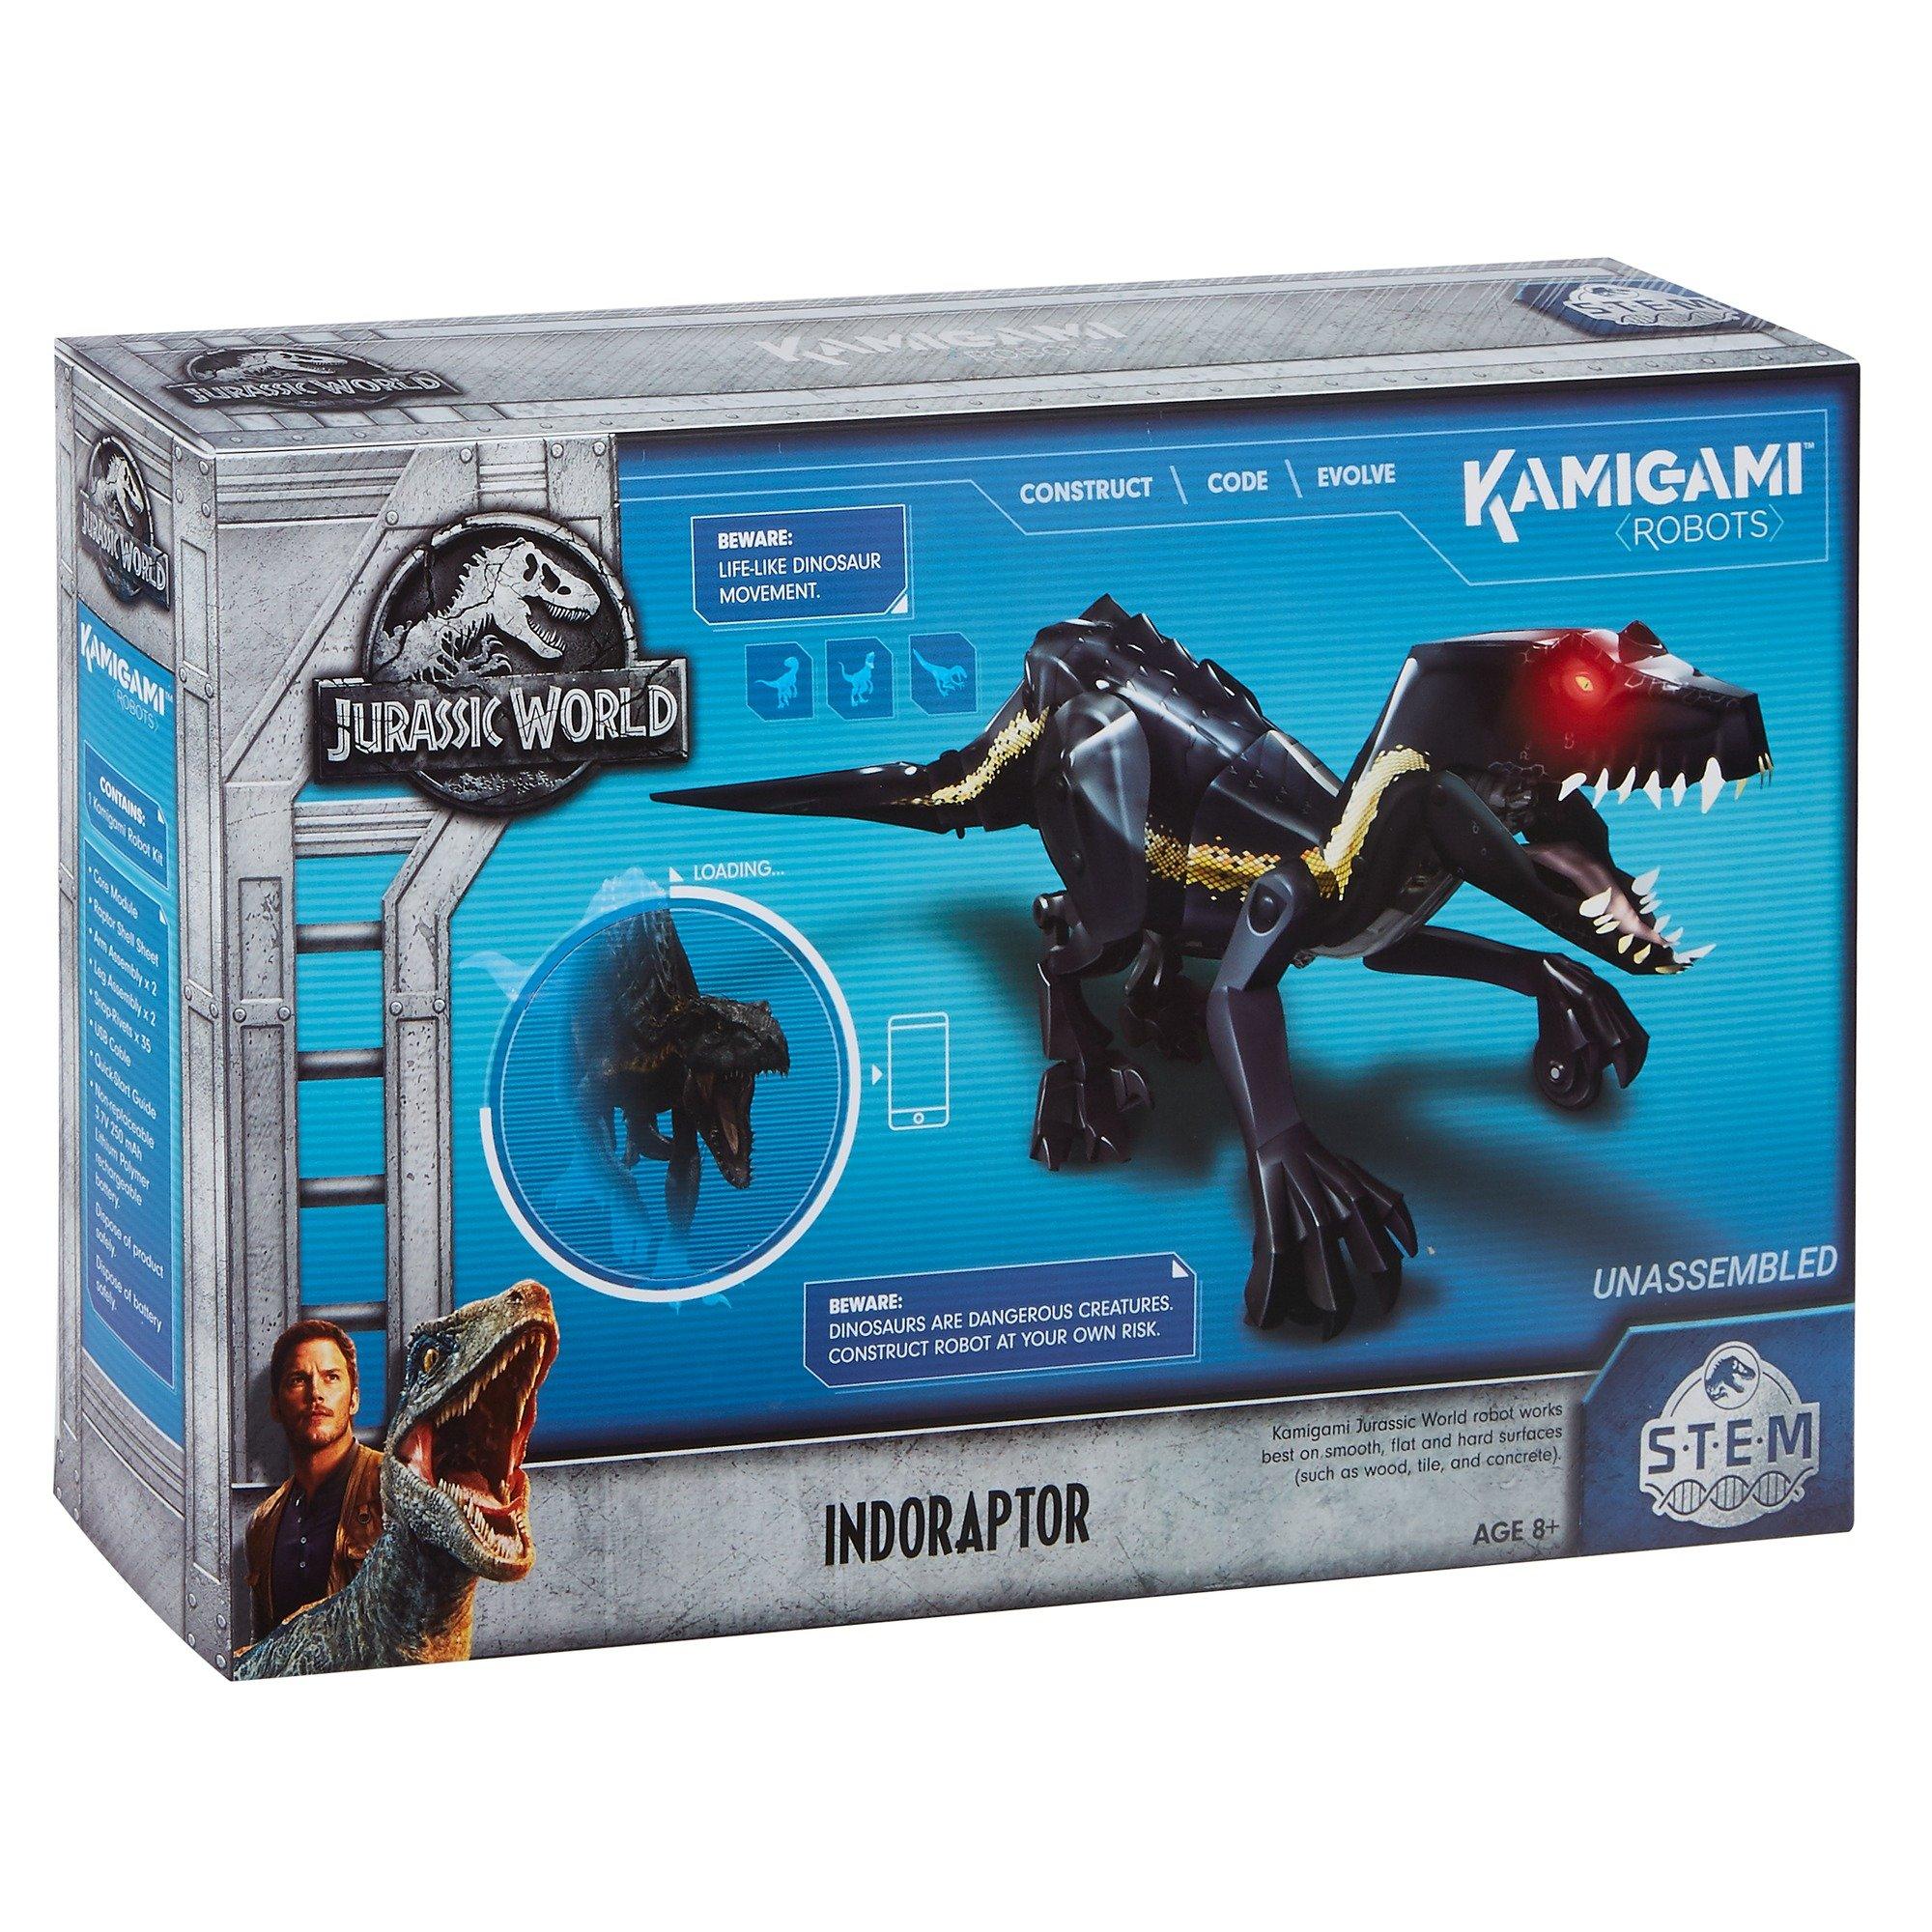 Kamigami Jurassic World Indoraptor Robot by Jurassic World Toys (Image #6)